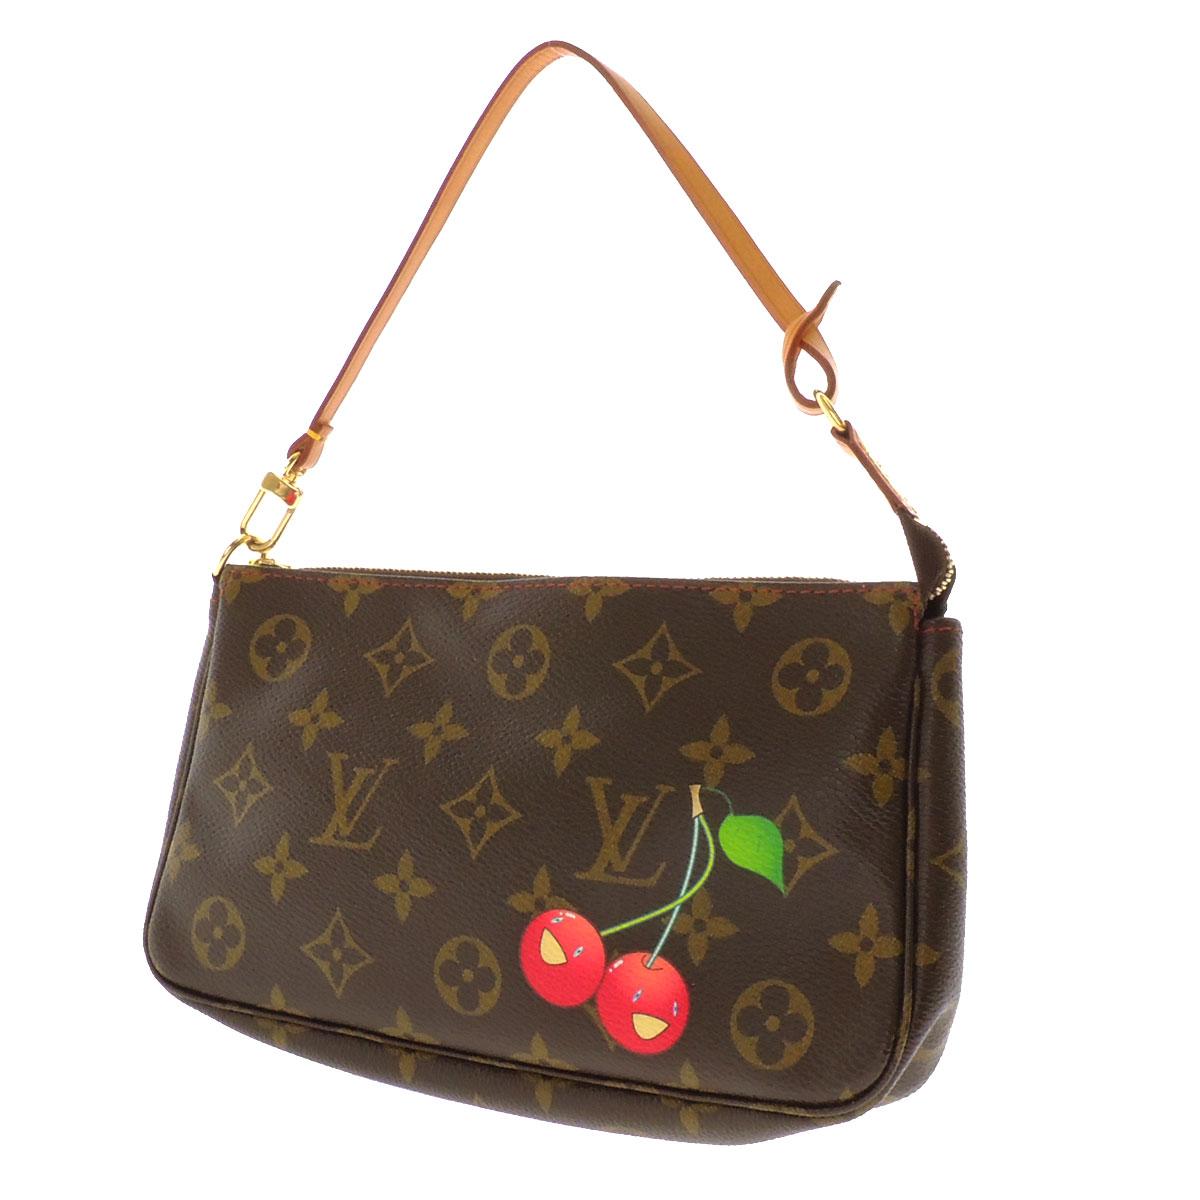 LOUIS VUITTON ポシェットアクセソワール M51980 accessory pouch cherry Monogram Canvas ladies